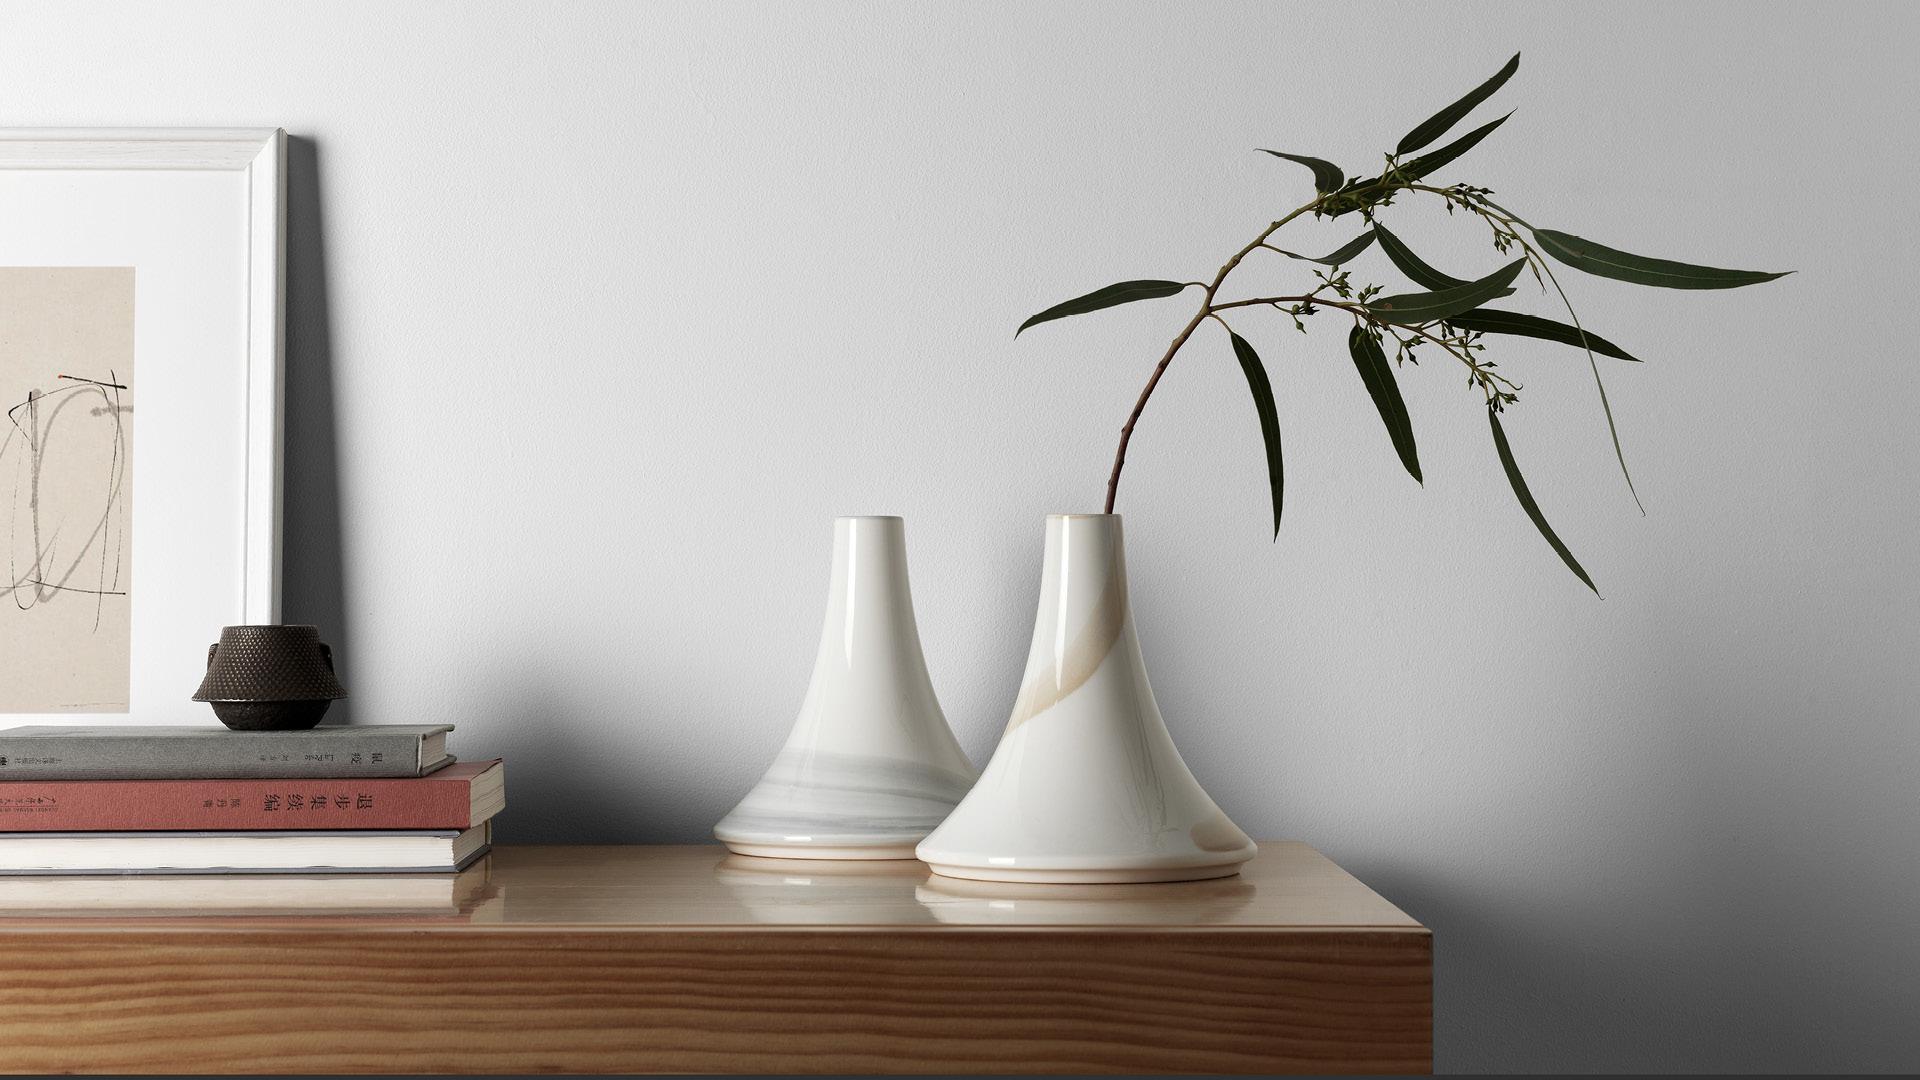 山晓花瓶|Hill Vase